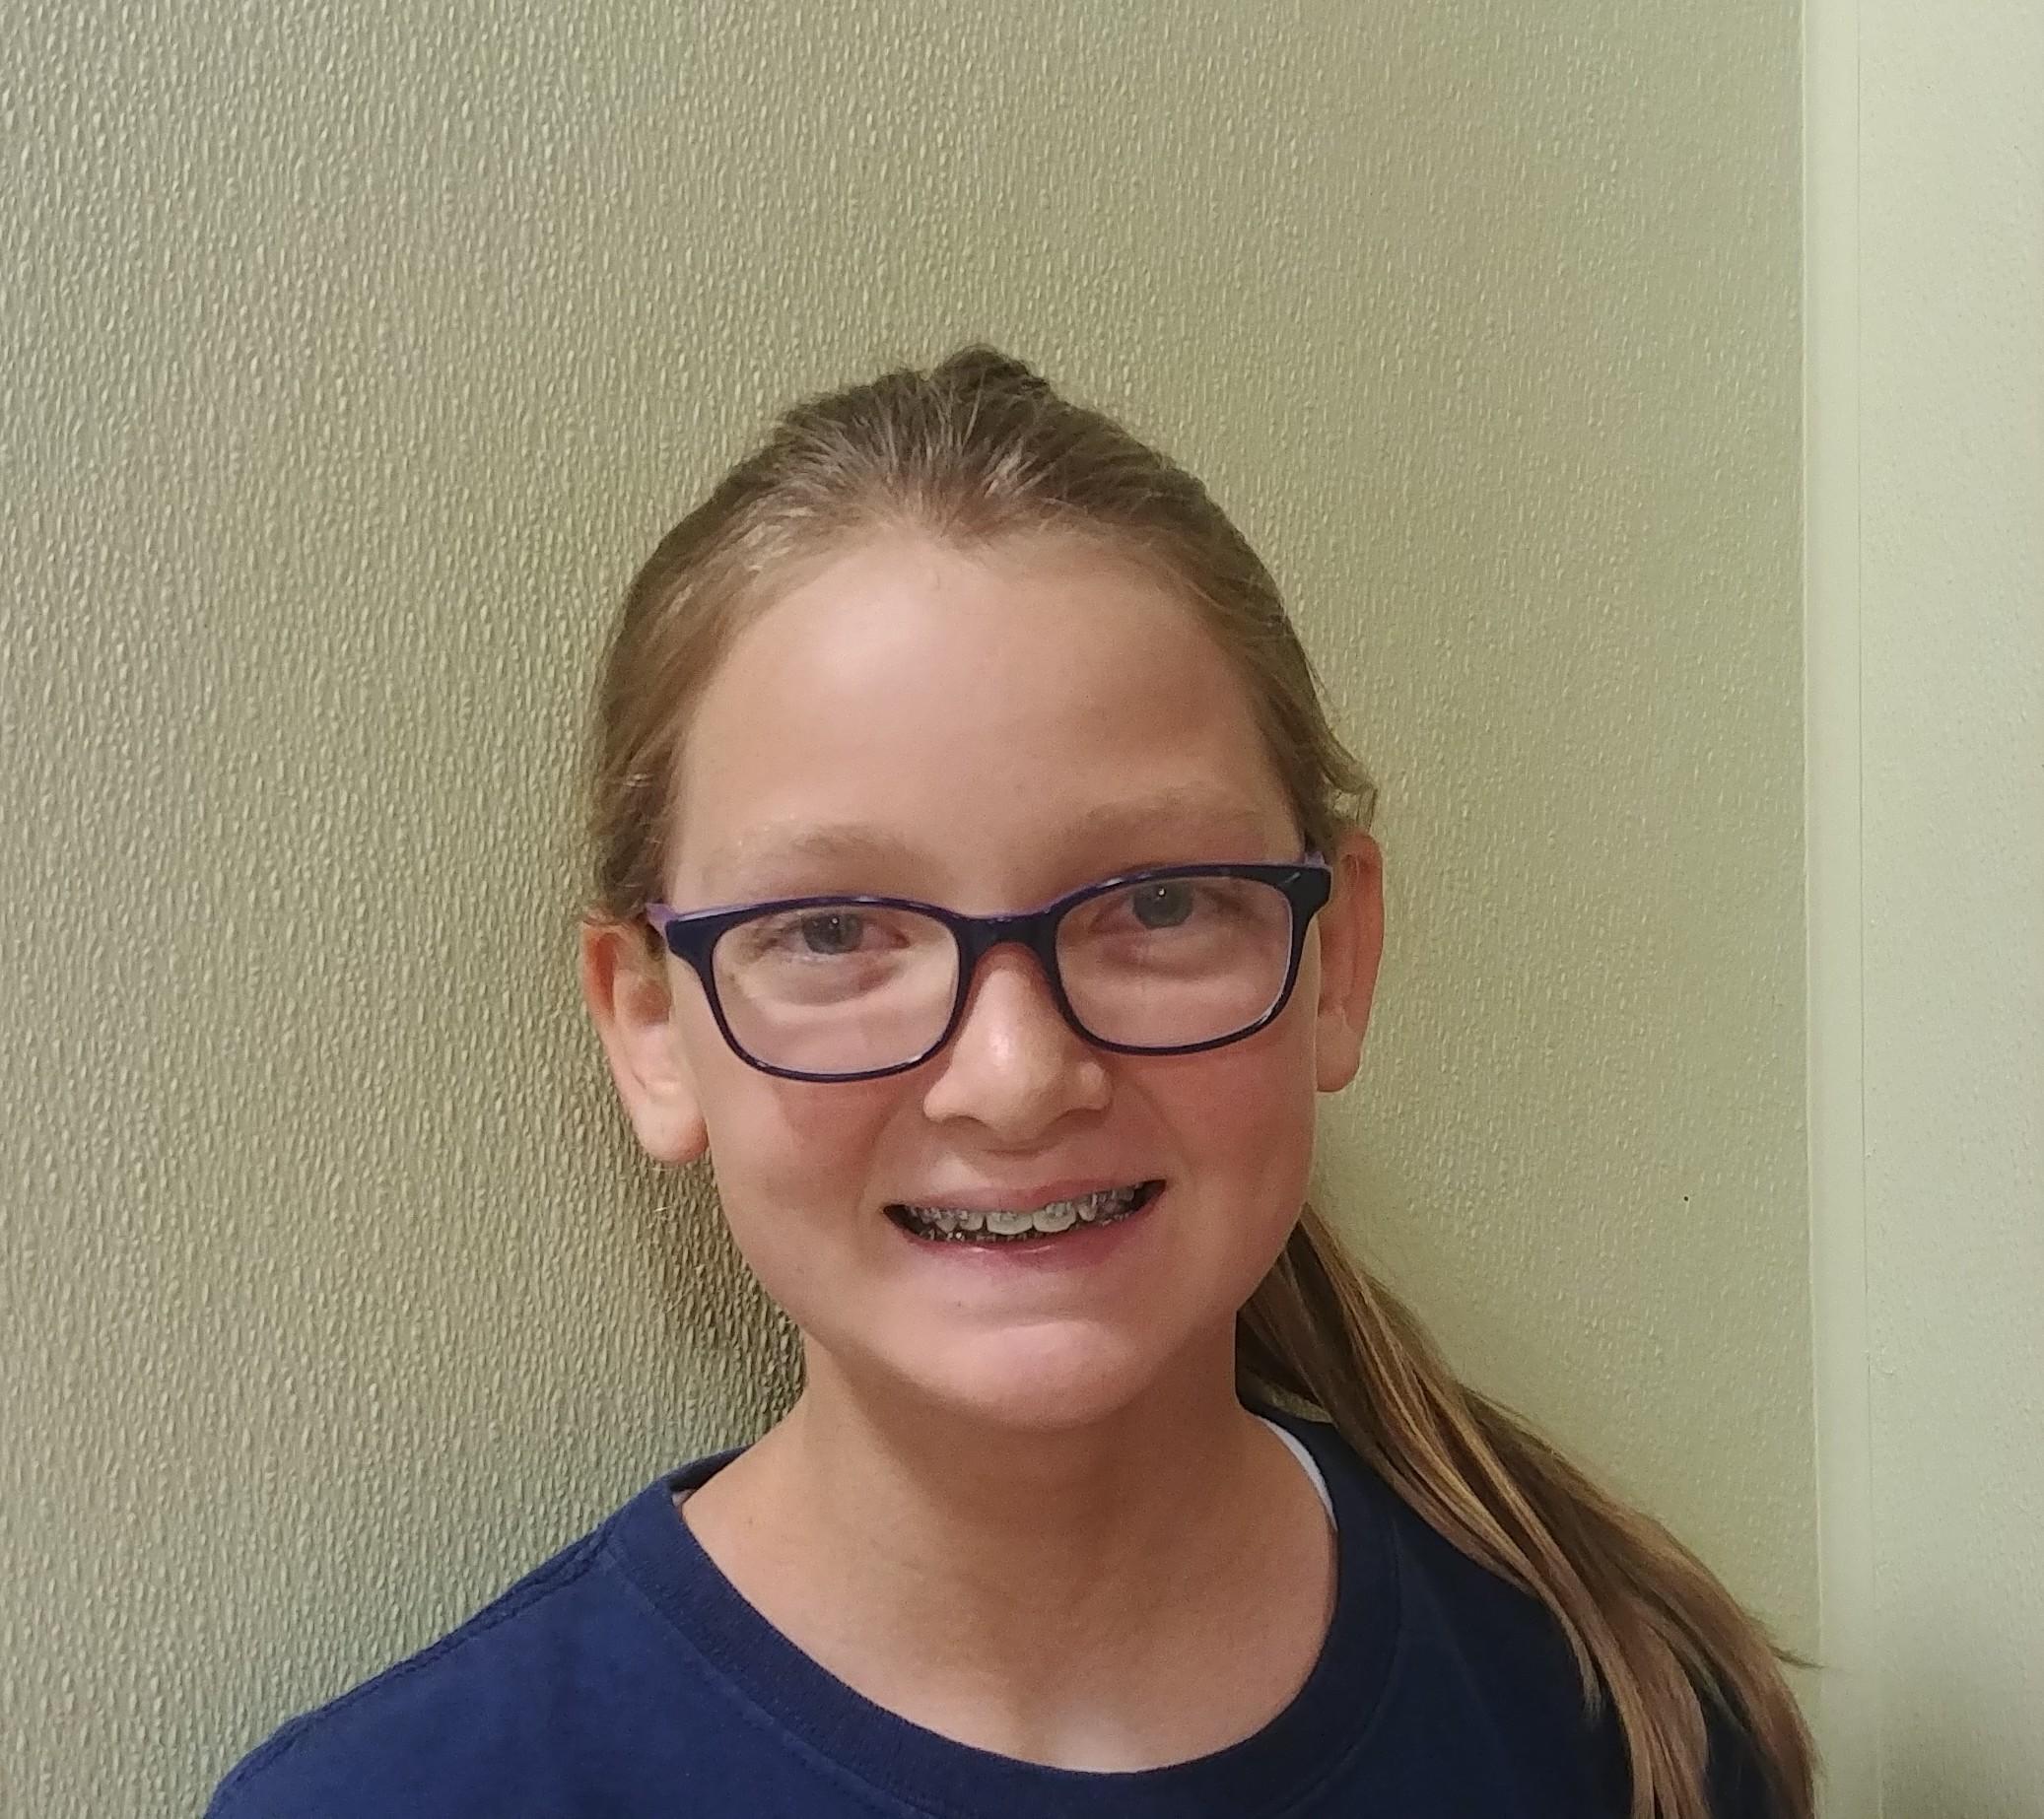 I like to go swimming because I do year-round swim.  Gracyn, Age 11  Daniel Island